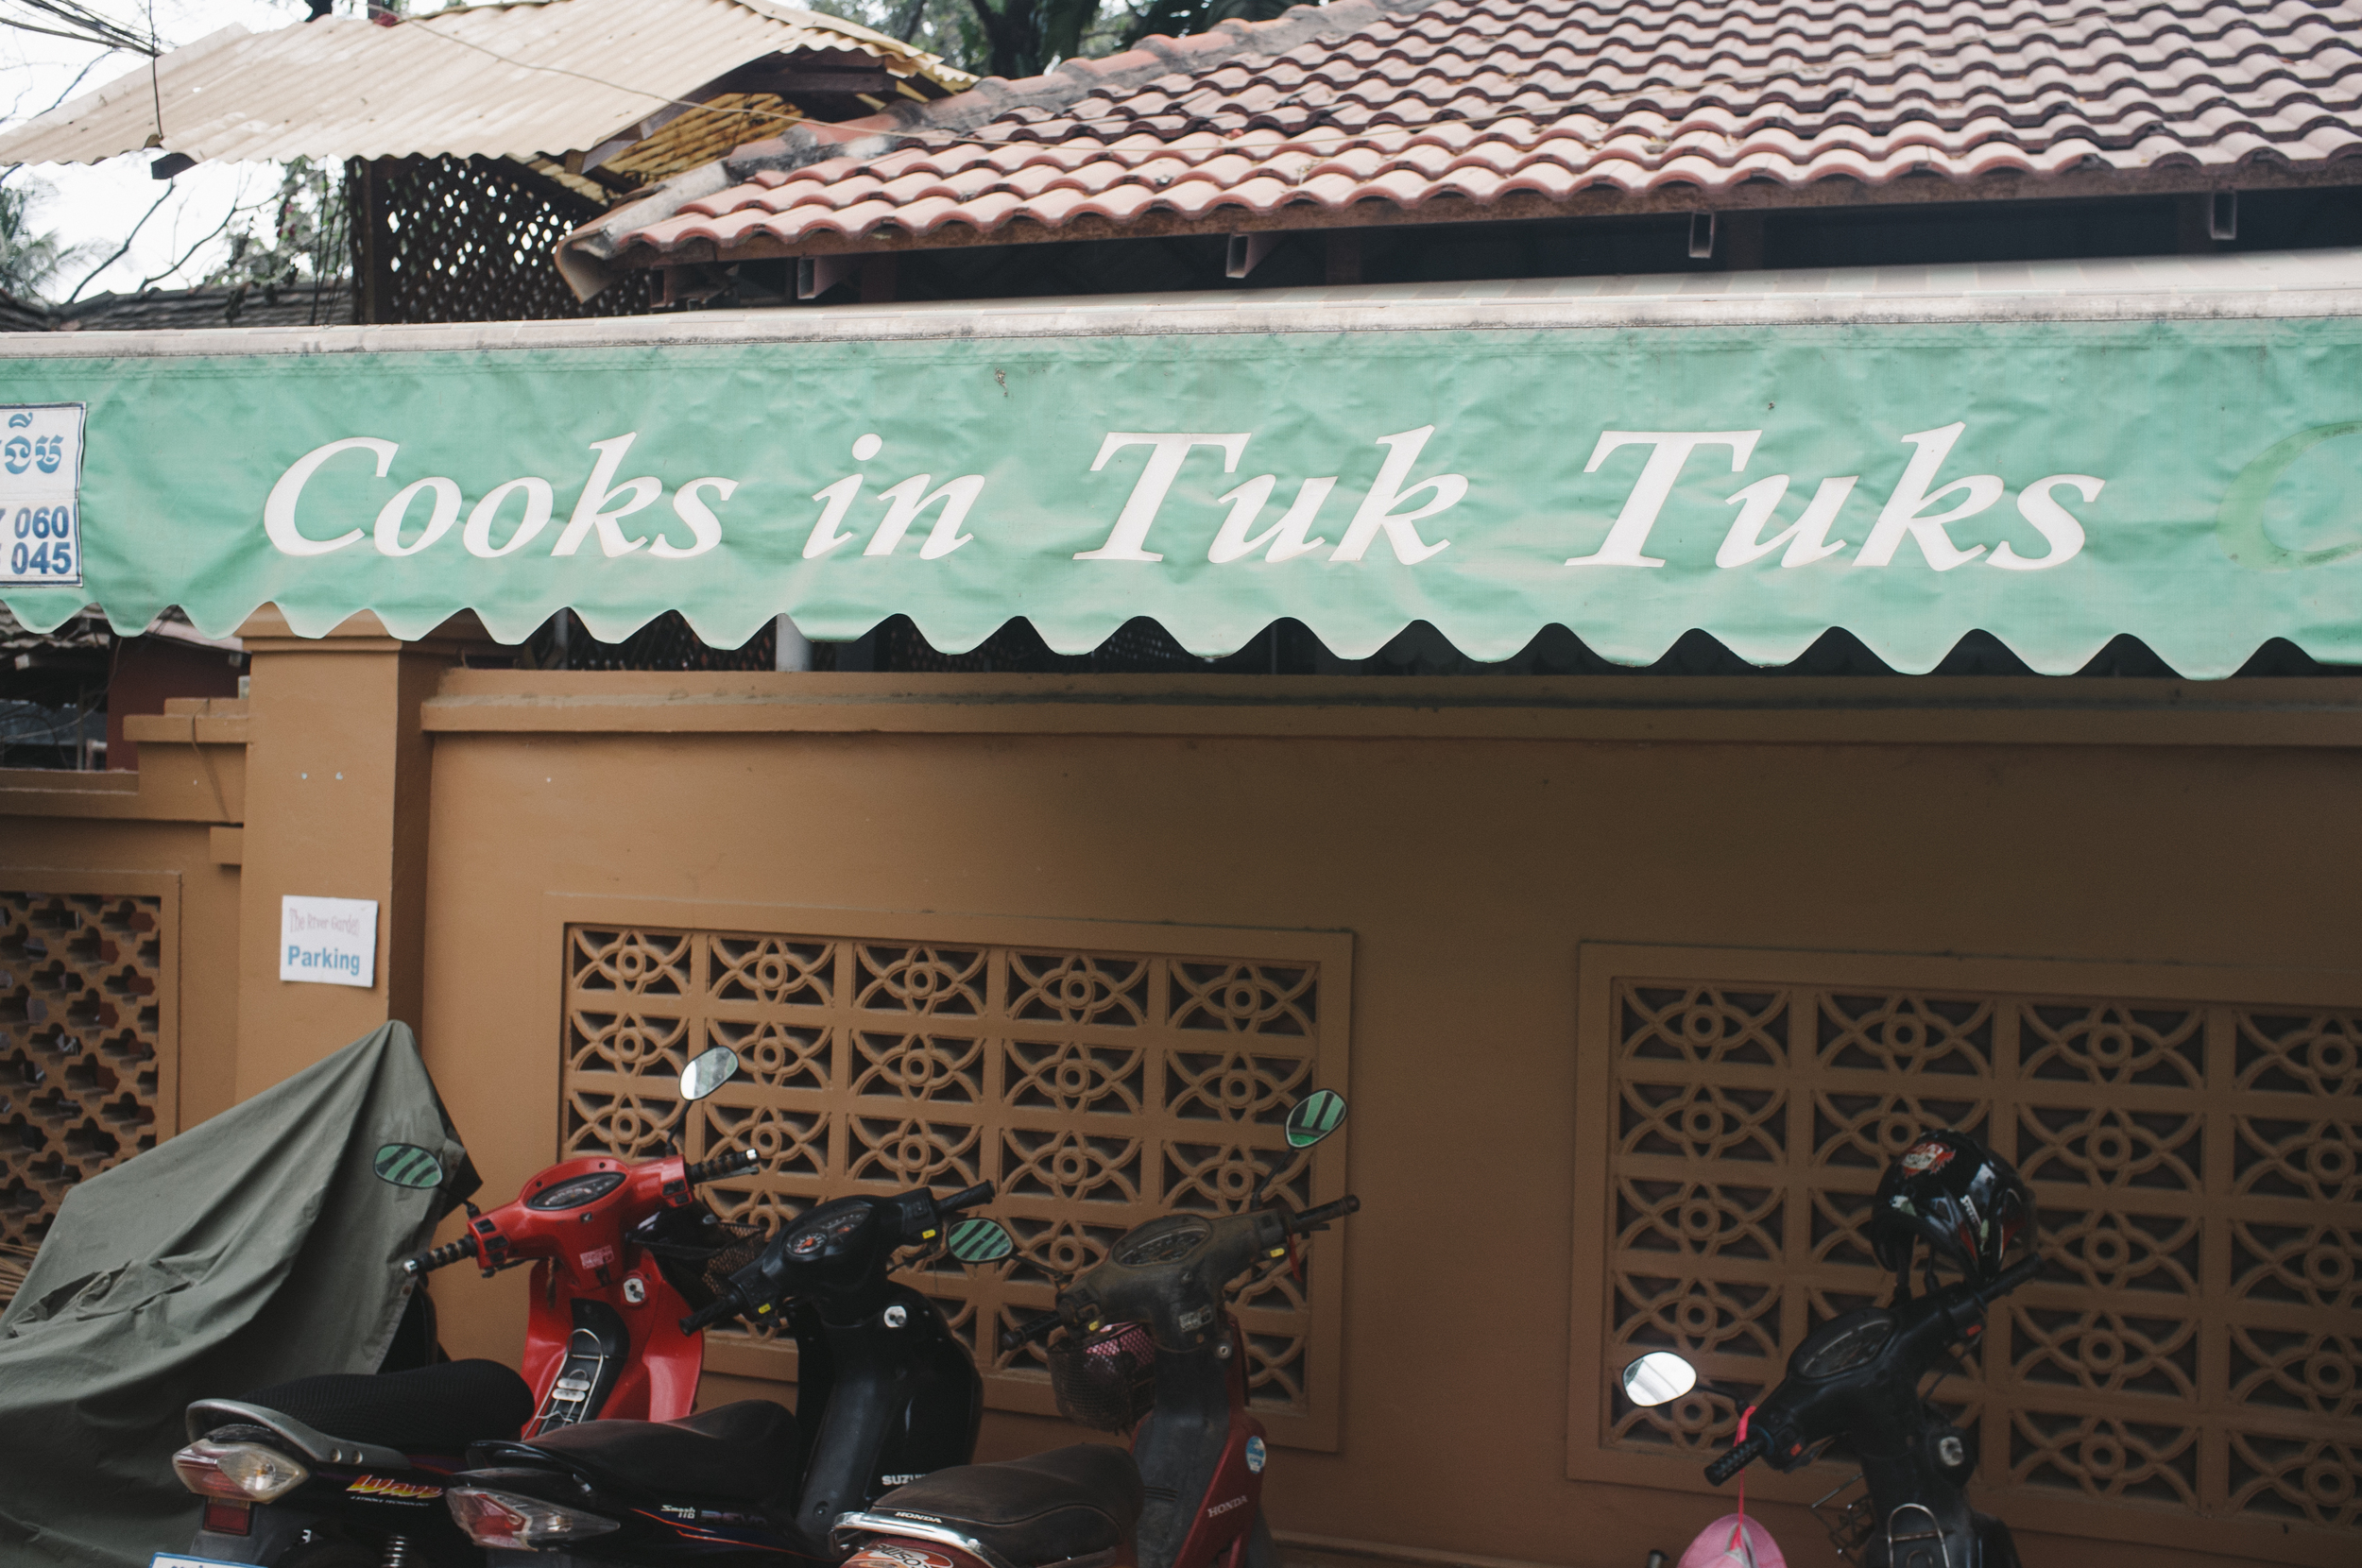 Siem Reap Cooks in Tuk Tuks.jpg